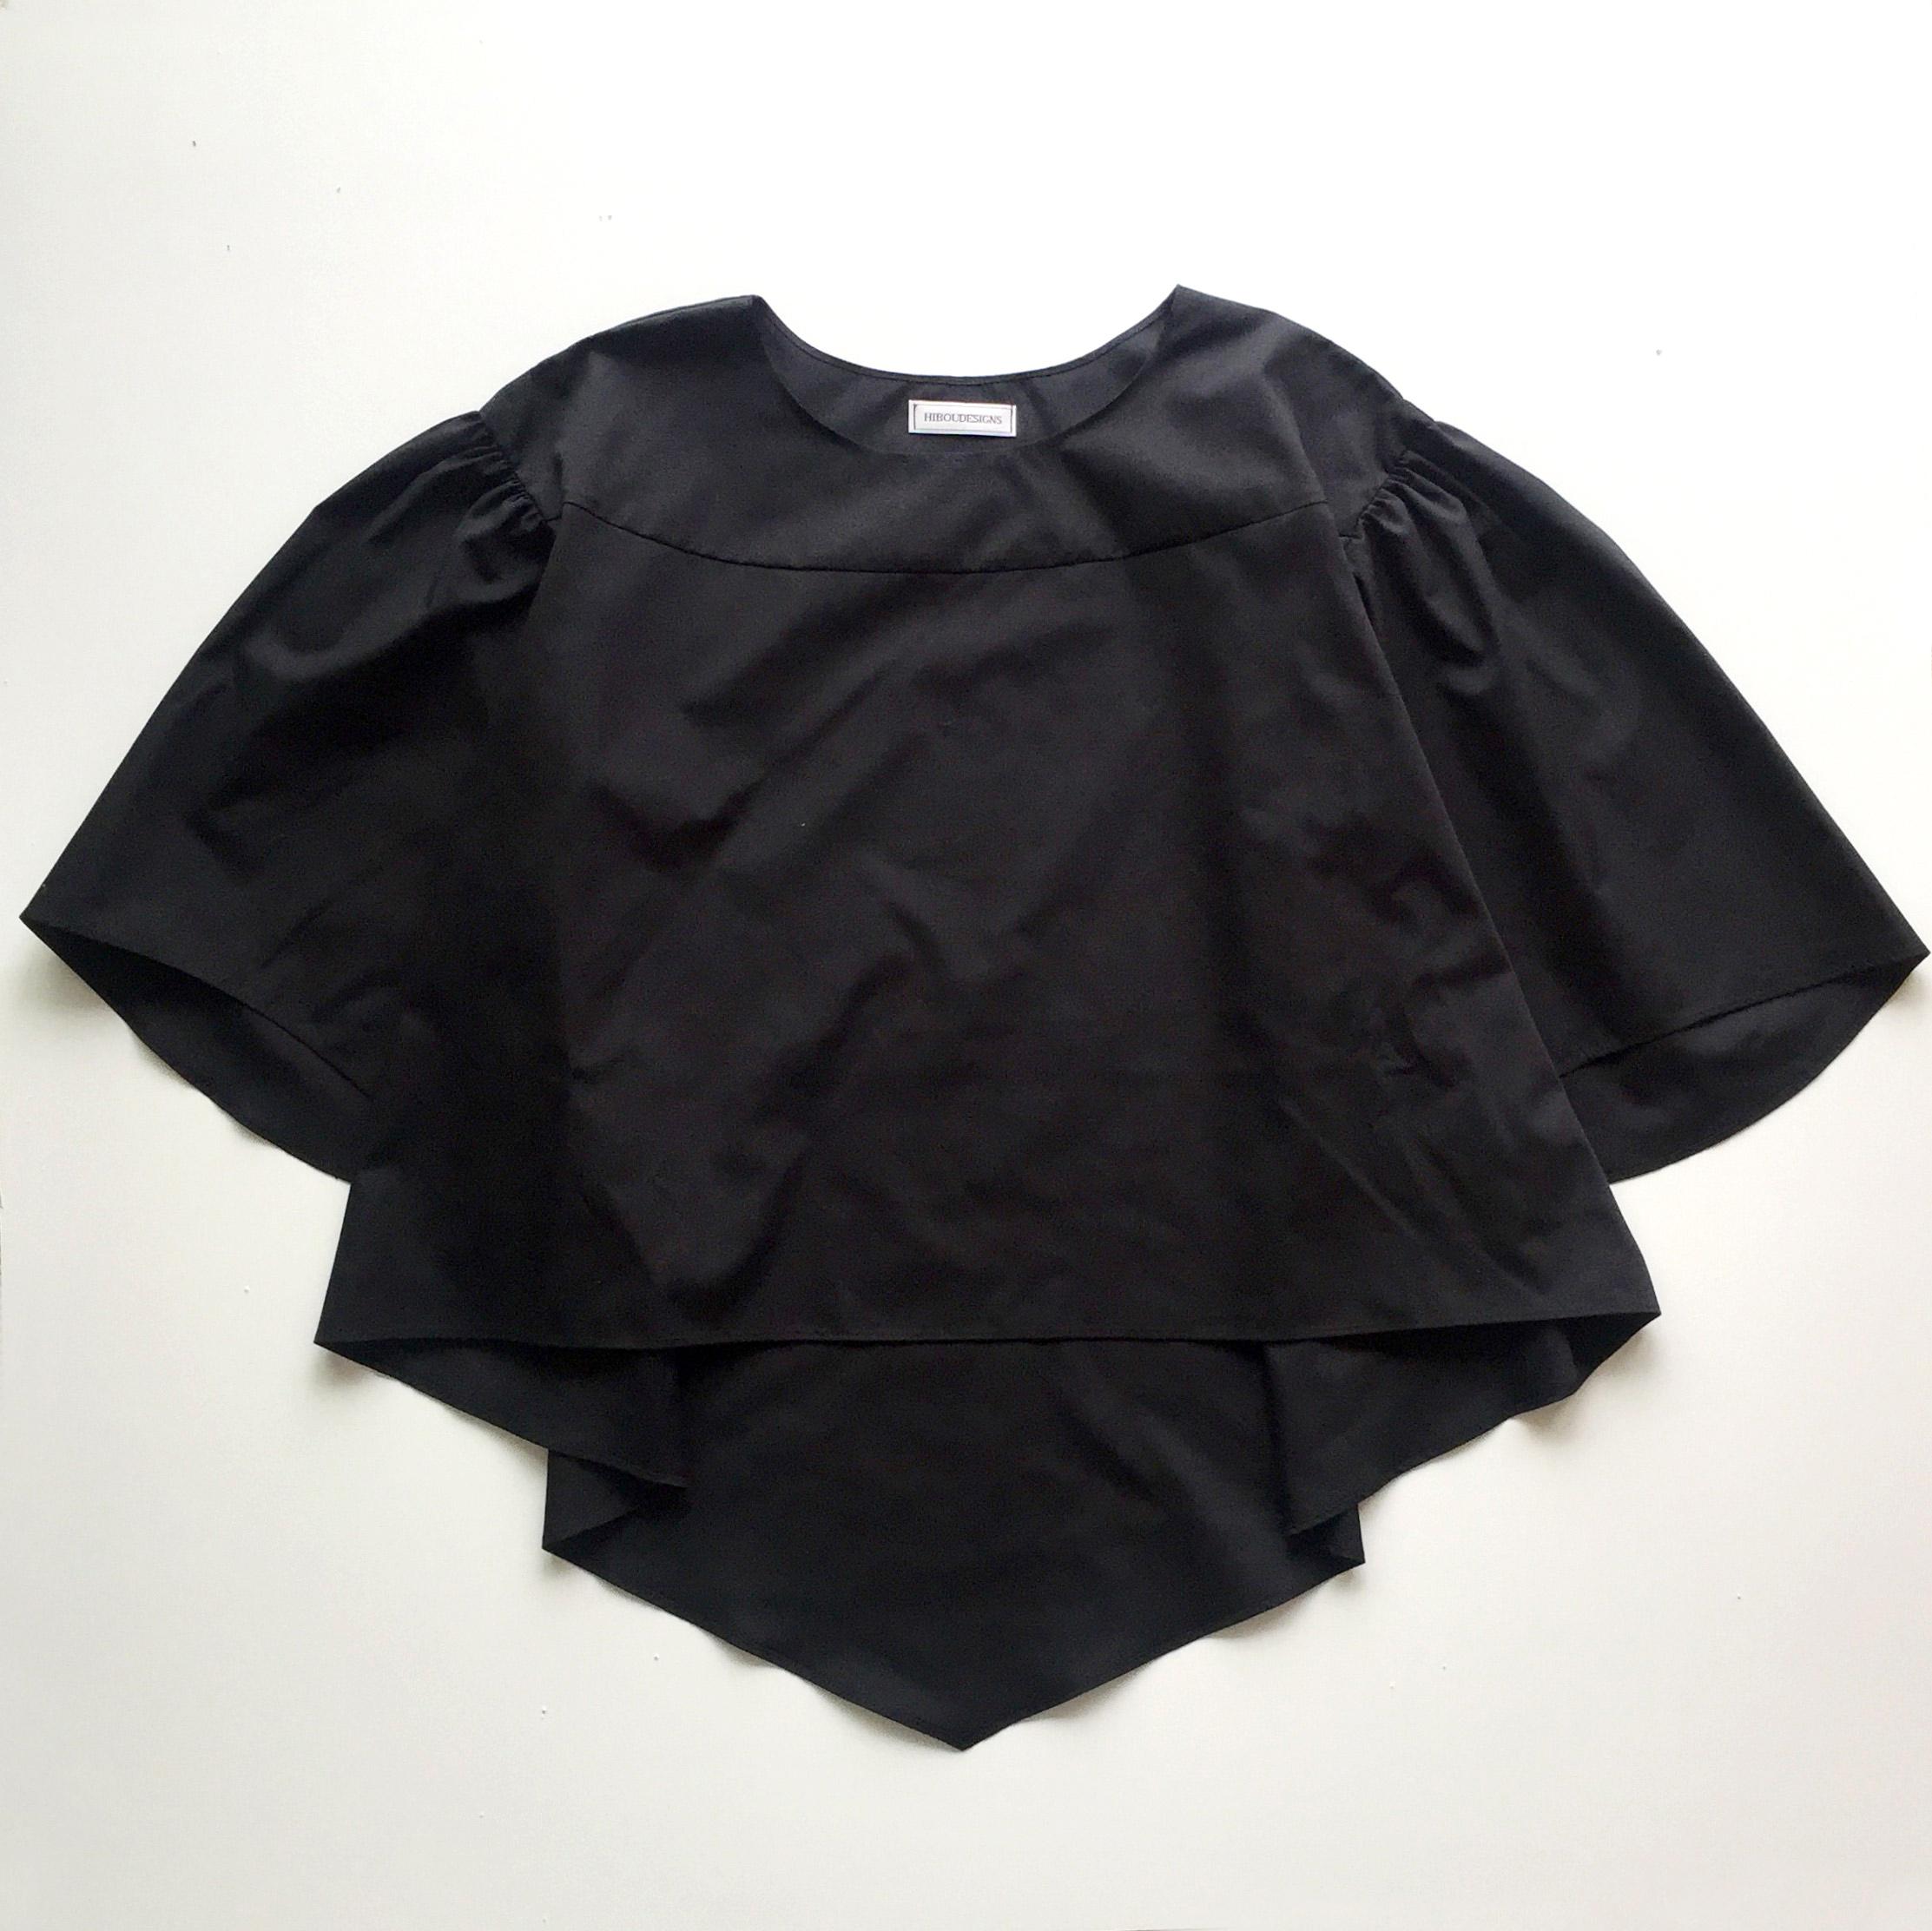 FLY (BLACK)